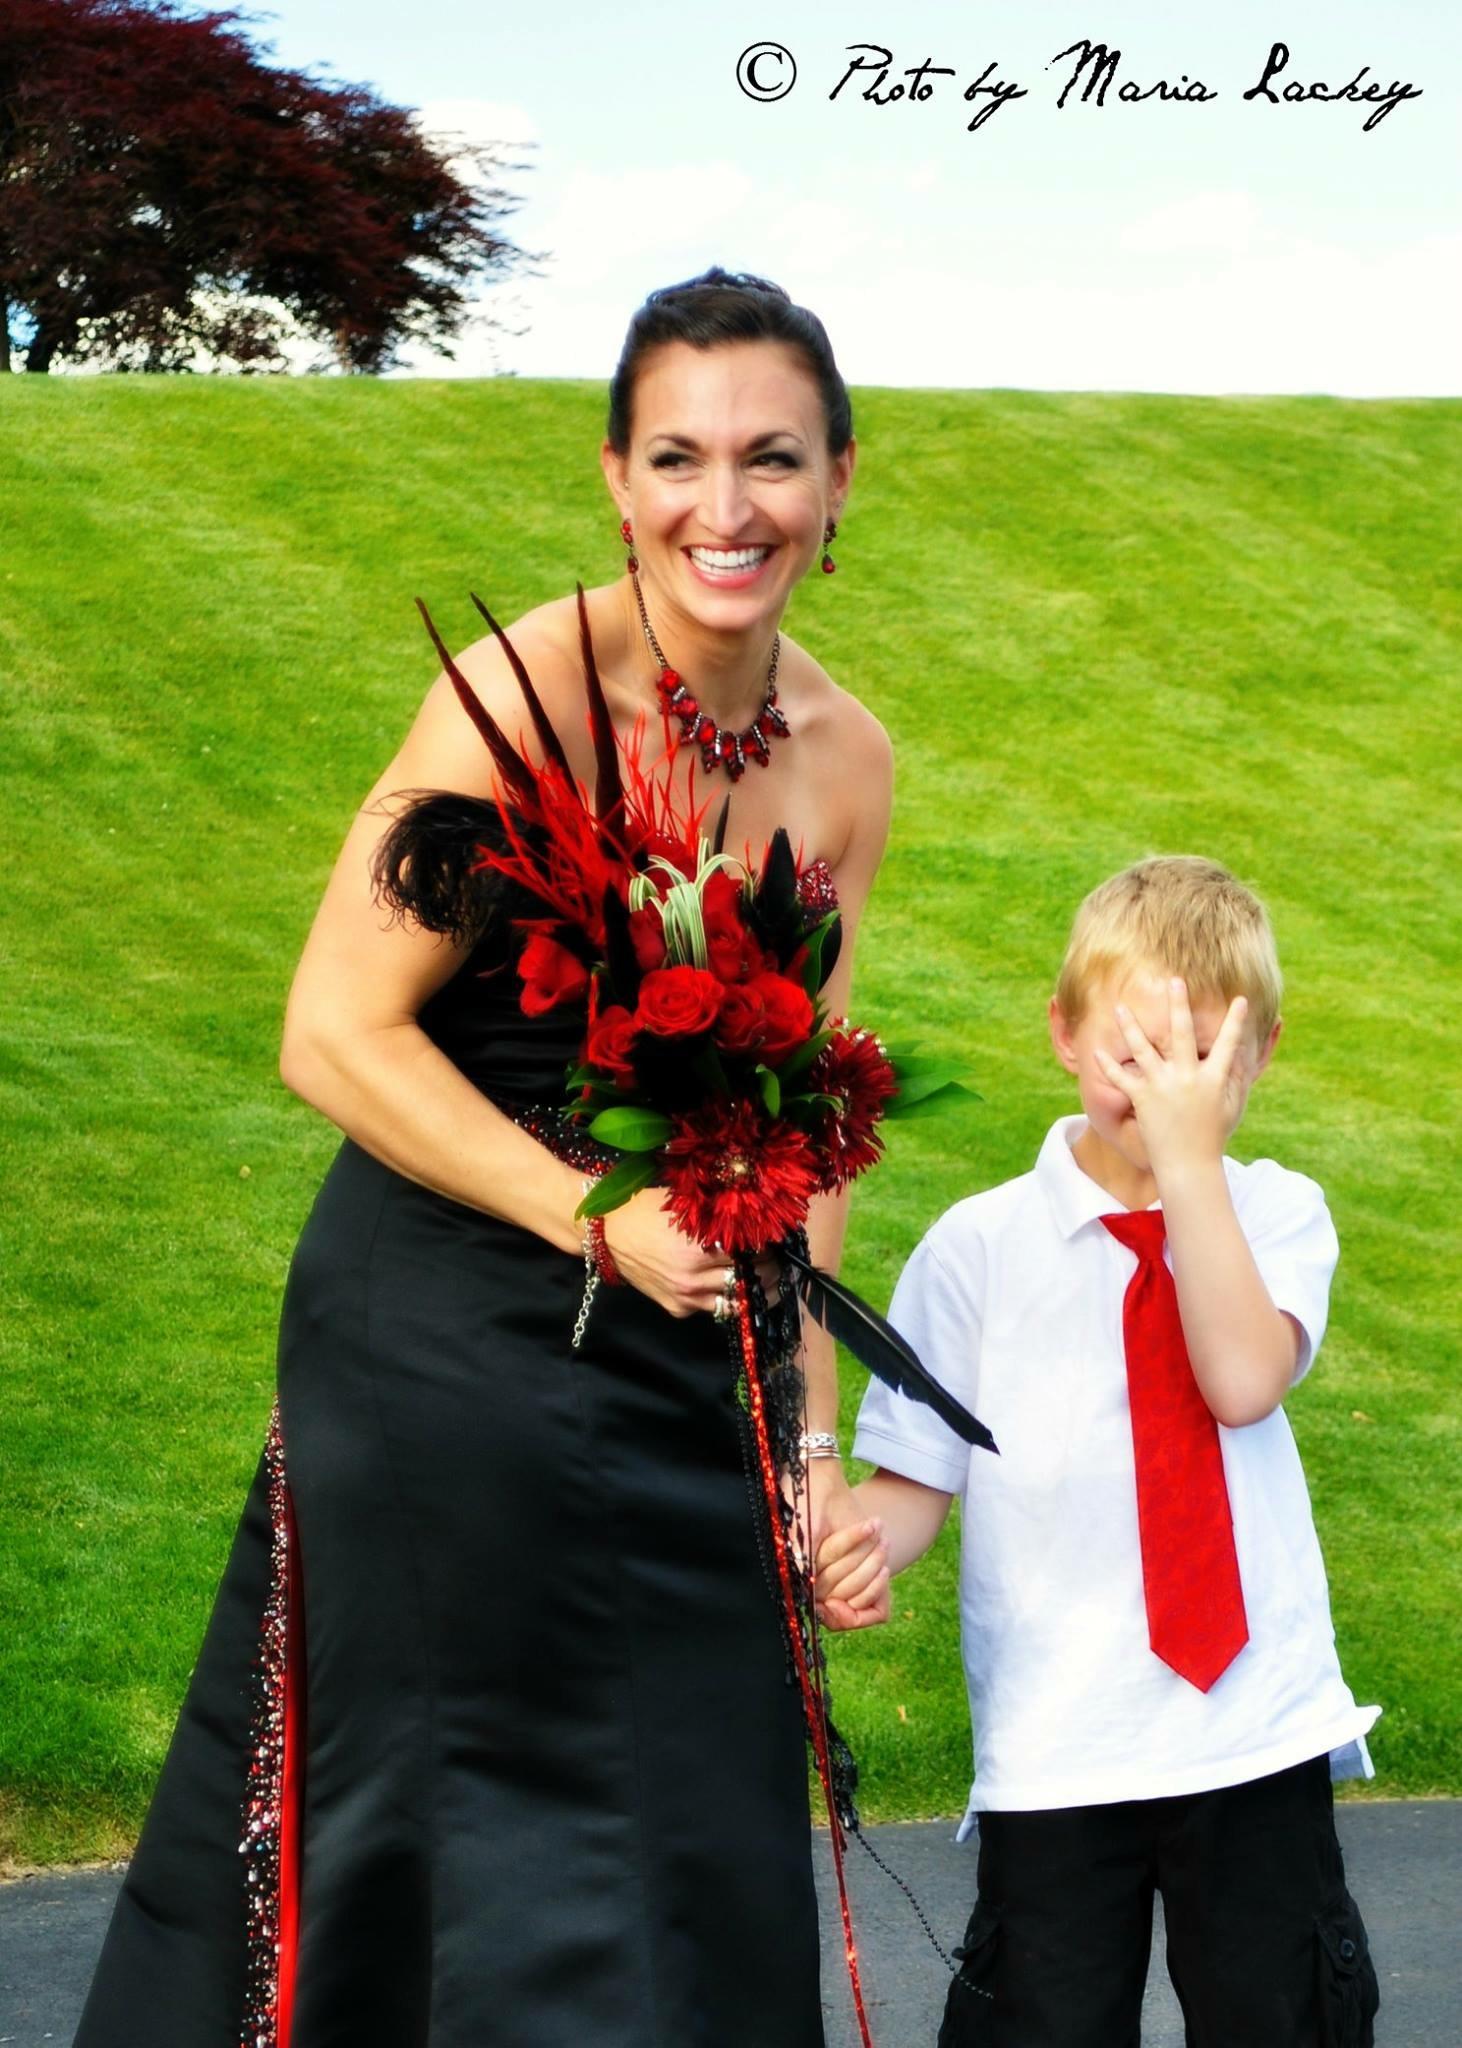 Wedding: Chris Scott and Paula Lamanna-Scott